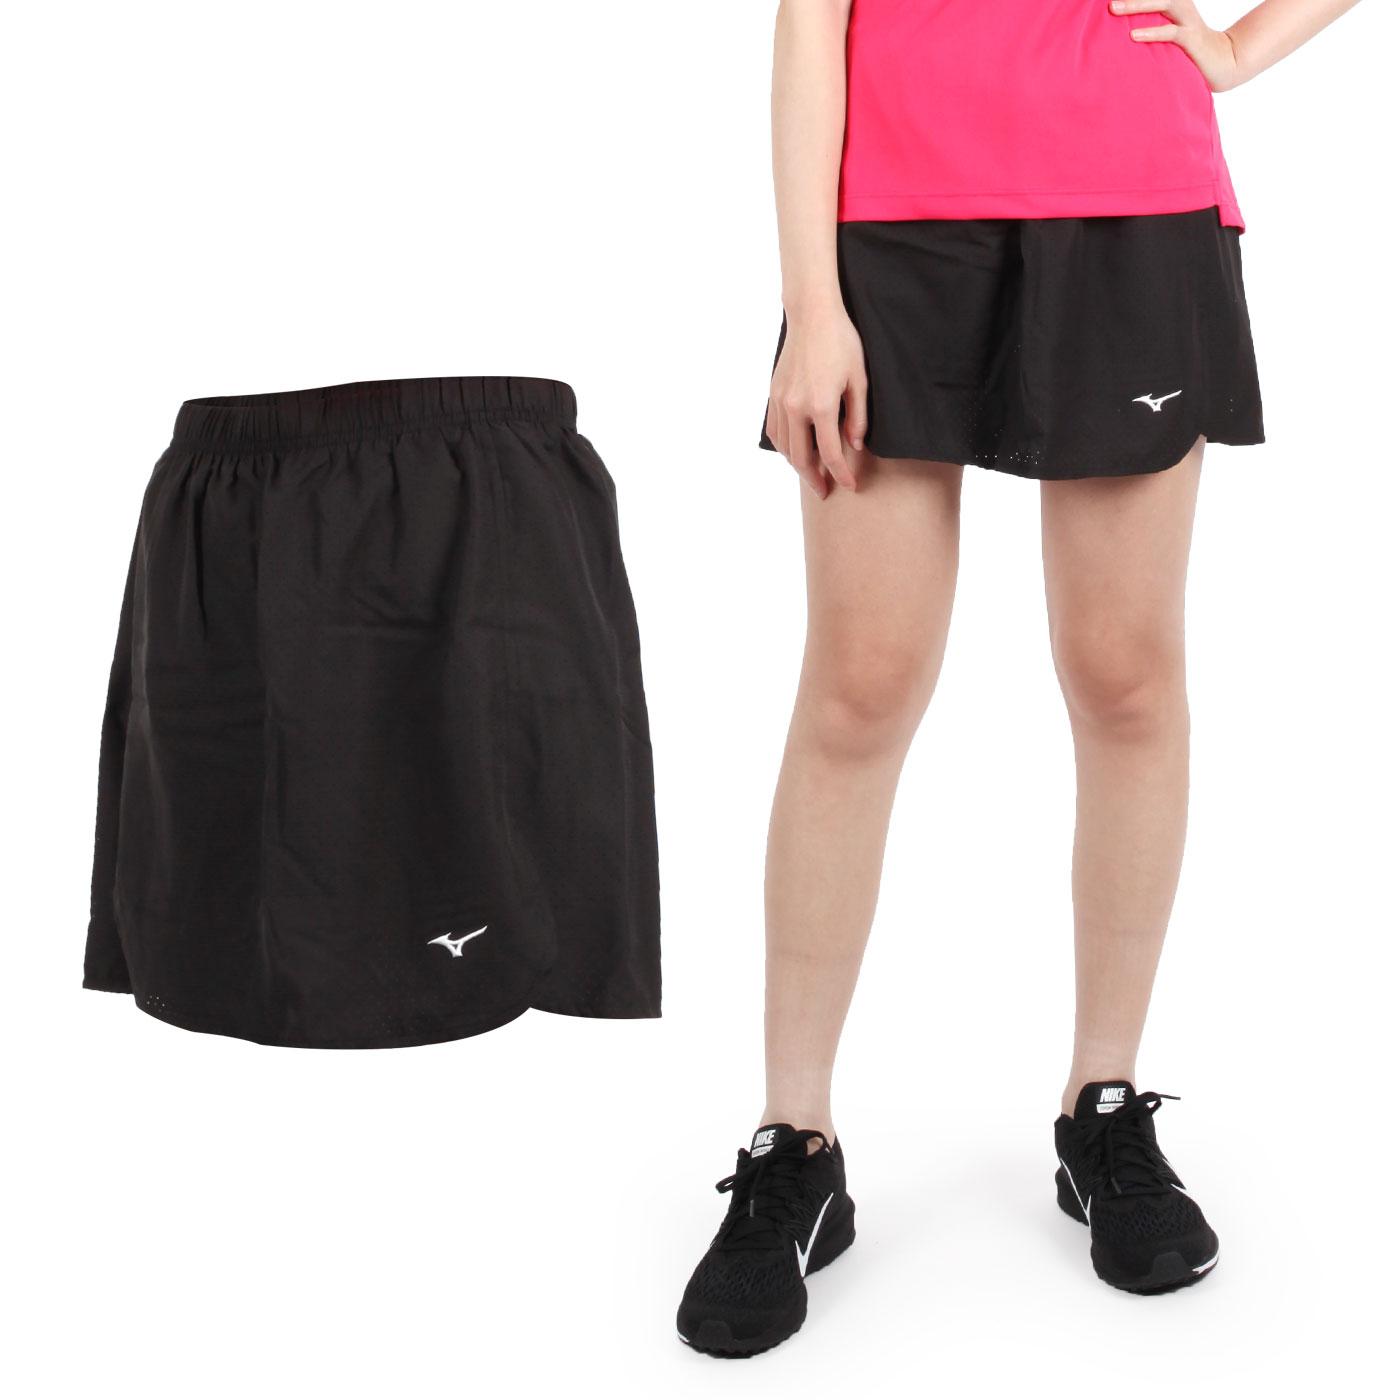 MIZUNO 女款羽球褲裙 72TB8C0109 - 黑白